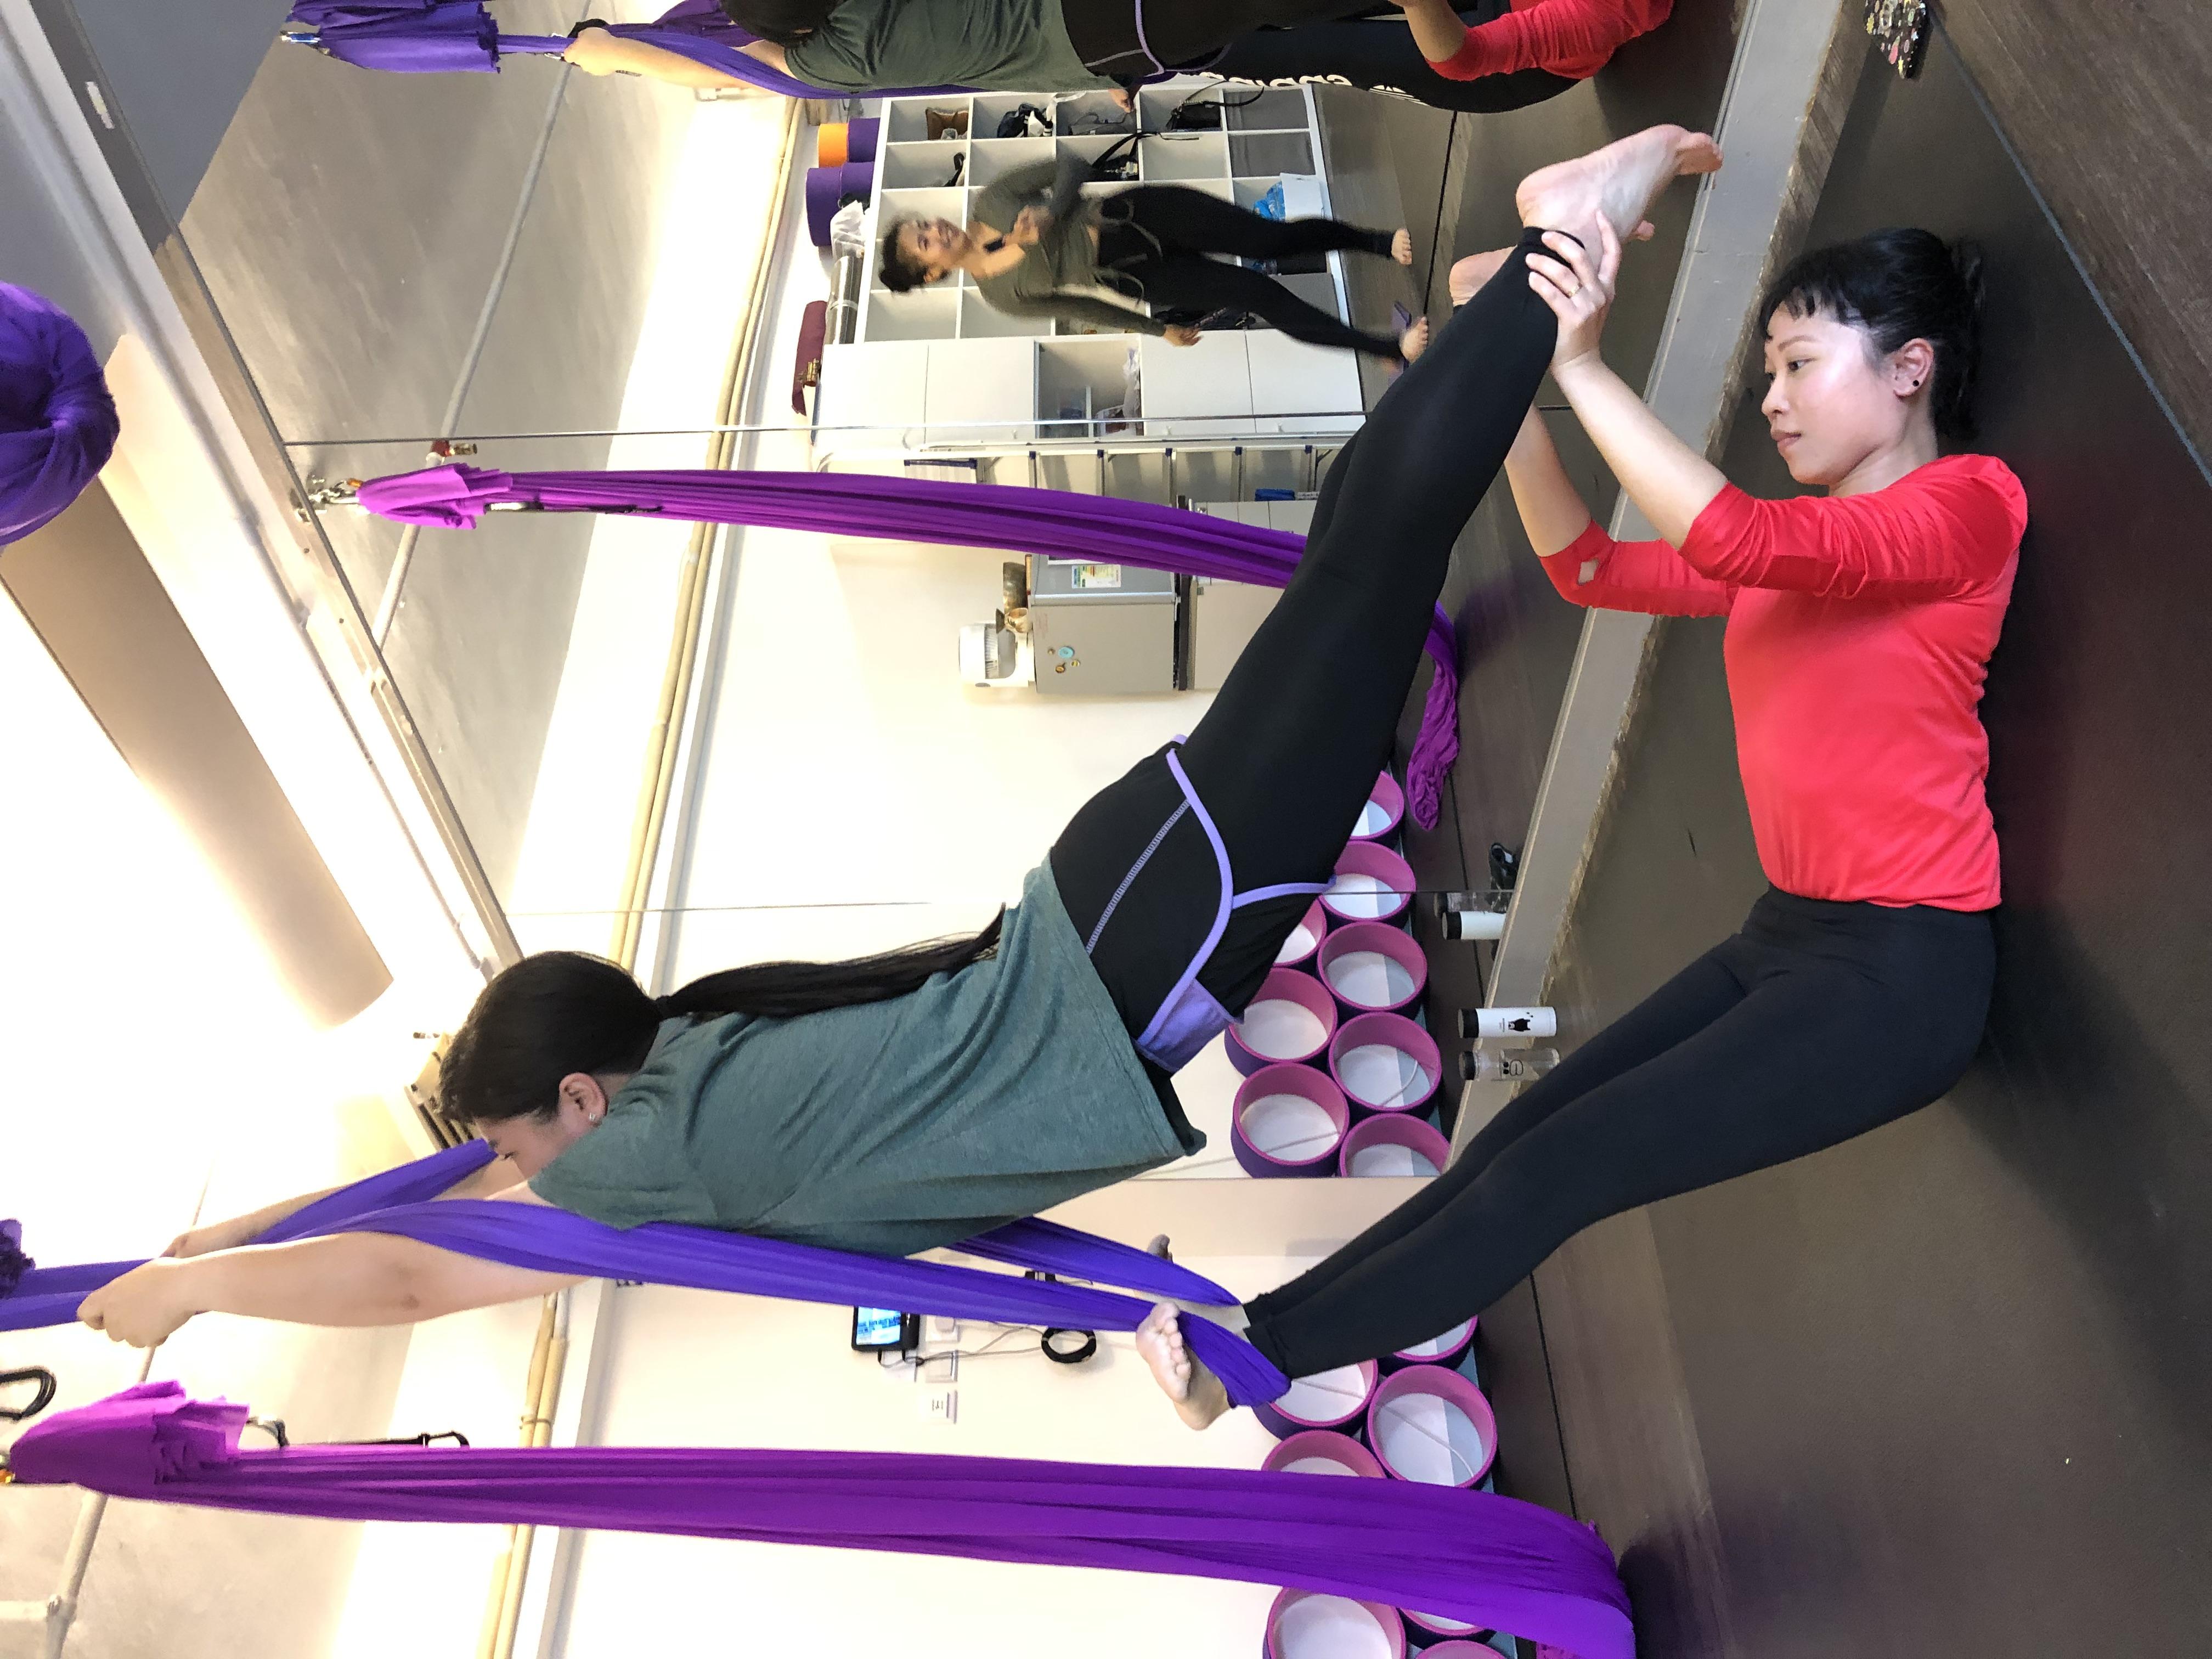 Sincere Yoga 善瑜伽| 觀塘瑜伽| 瑜伽導師課程| 觀塘空中瑜伽| 觀塘高溫瑜伽| Kwun Tong TRX| 工作坊